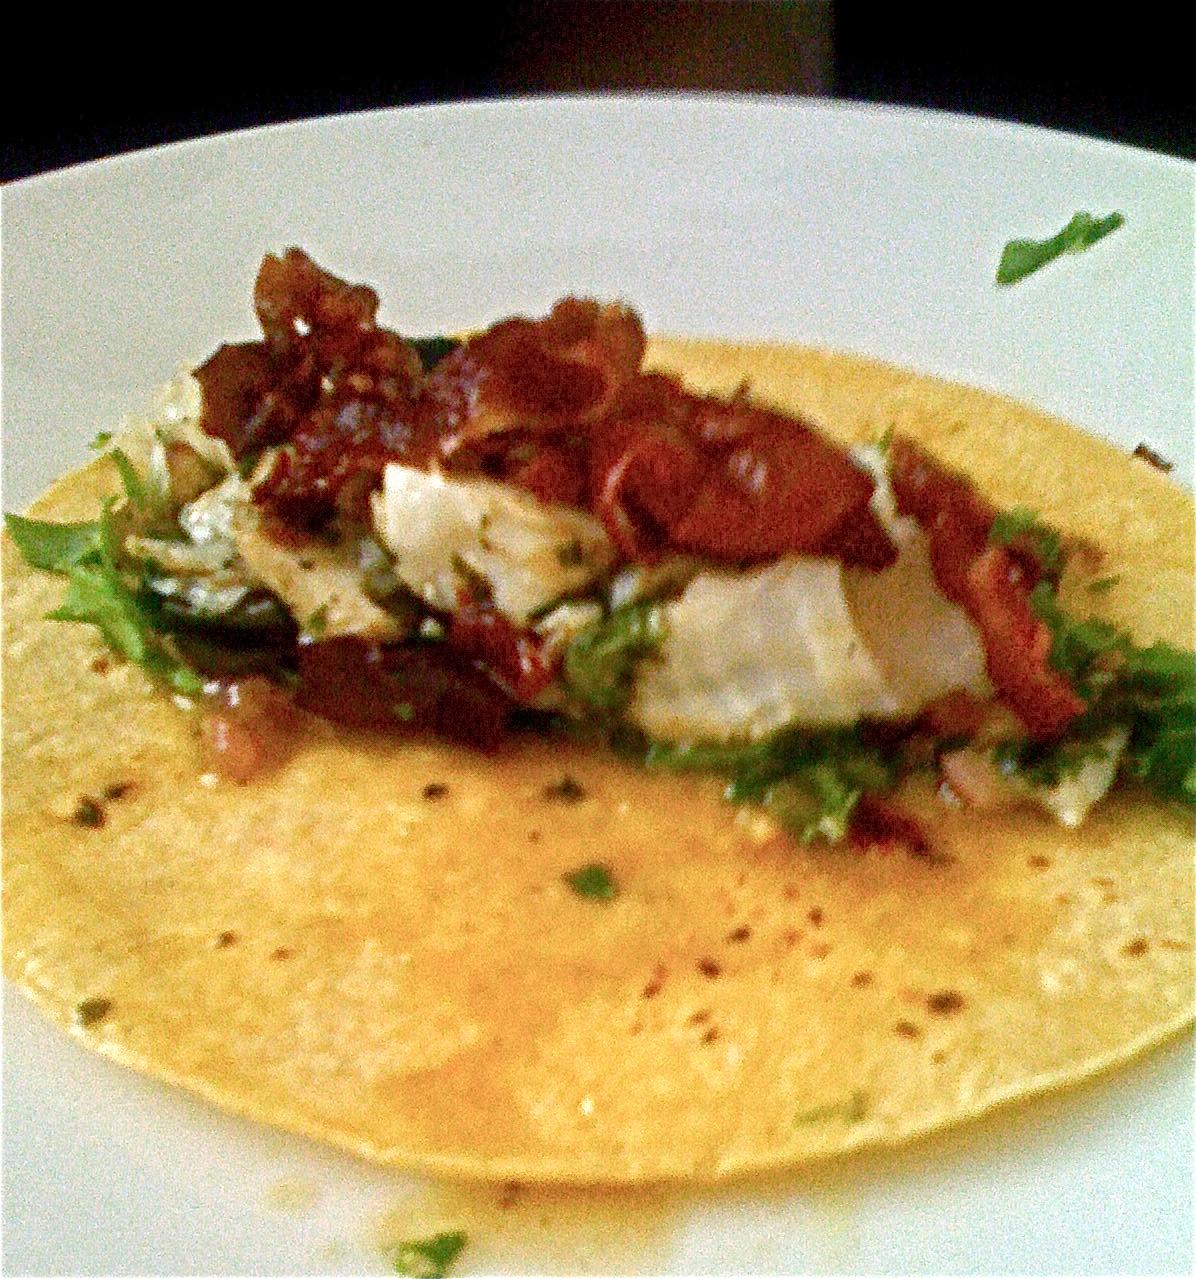 I tacos cooking jj 39 s way for Halibut fish tacos